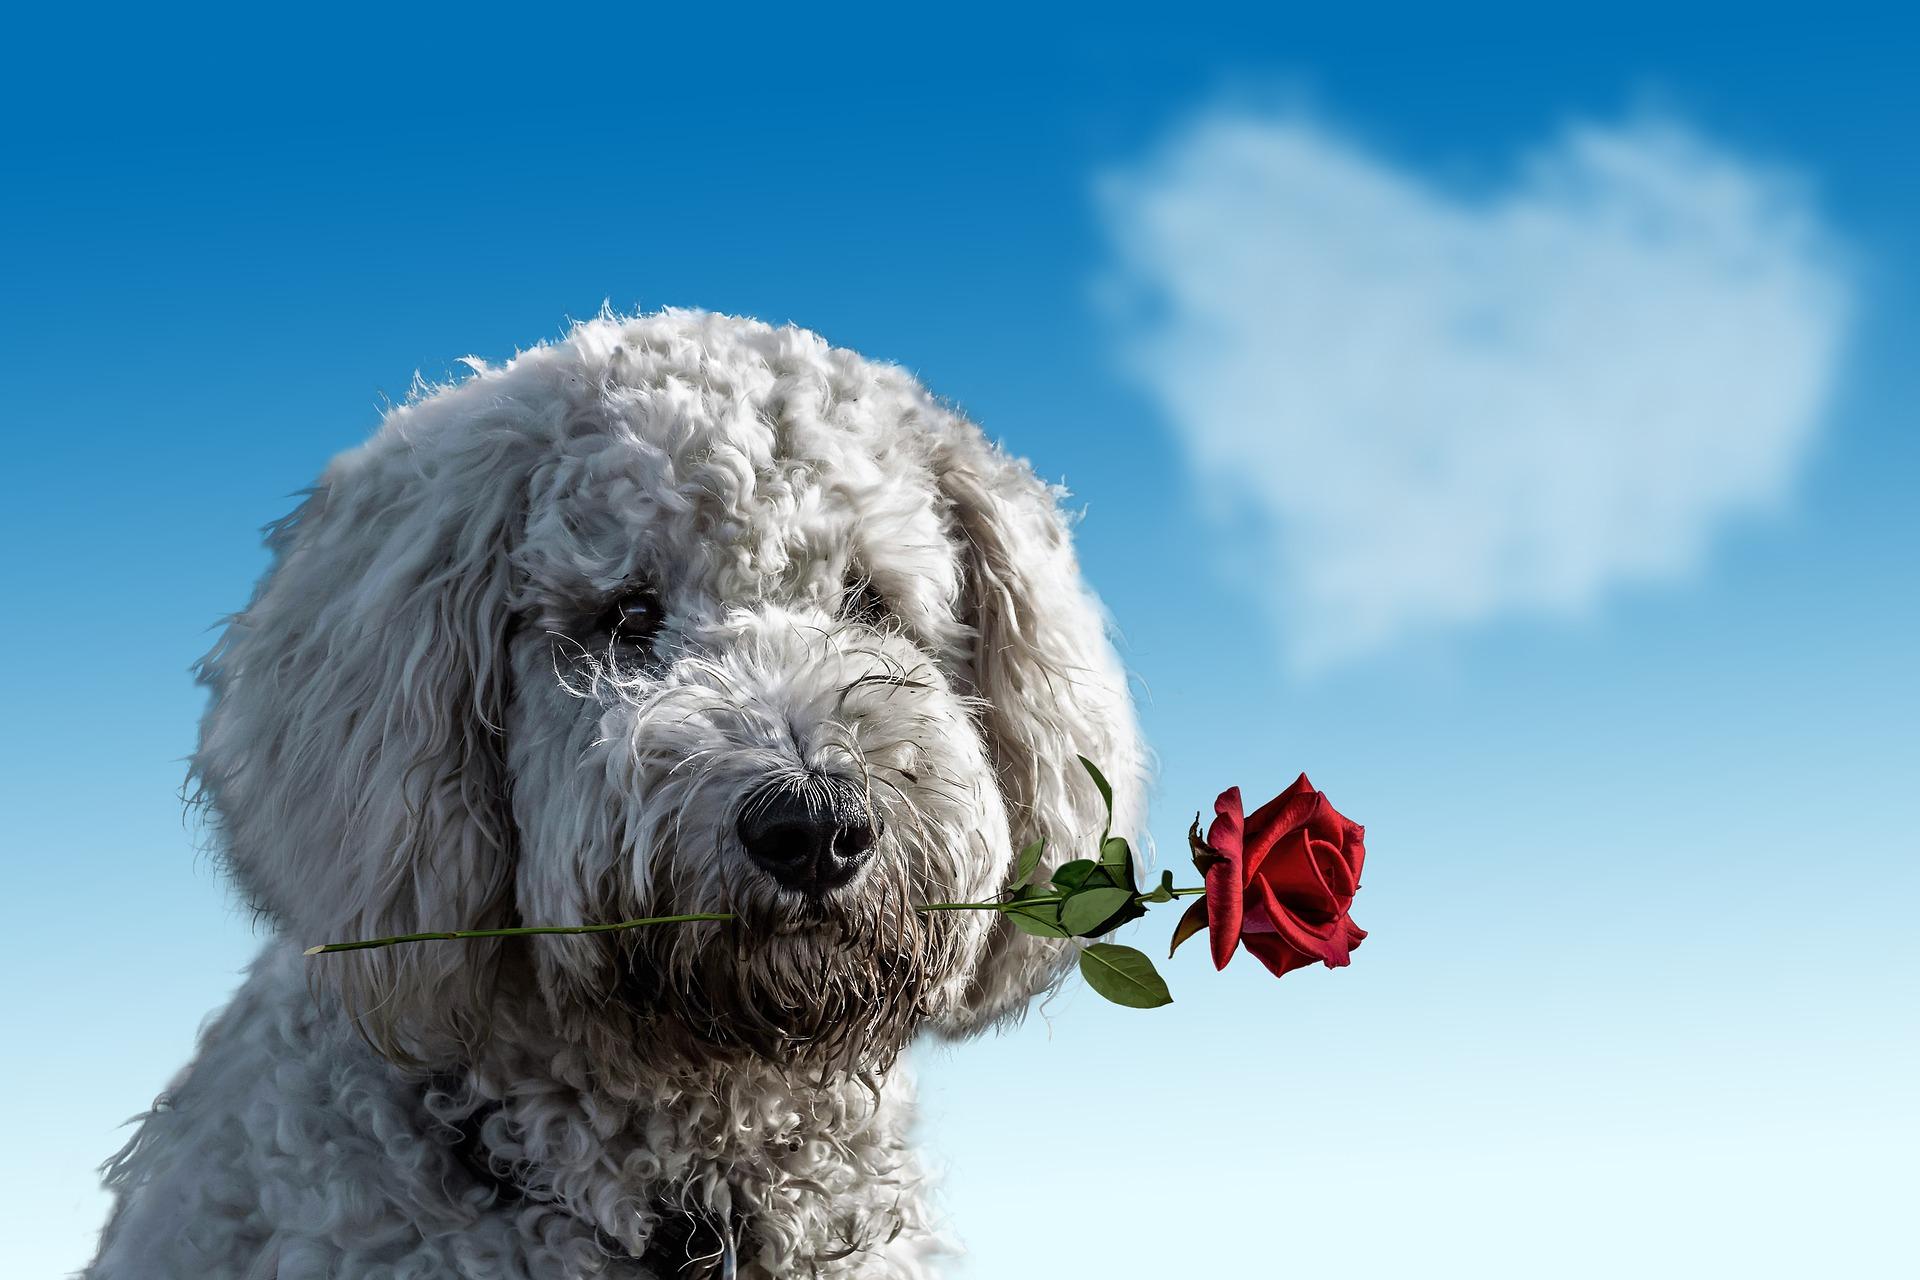 valentines-day-3135789_1920 (1)